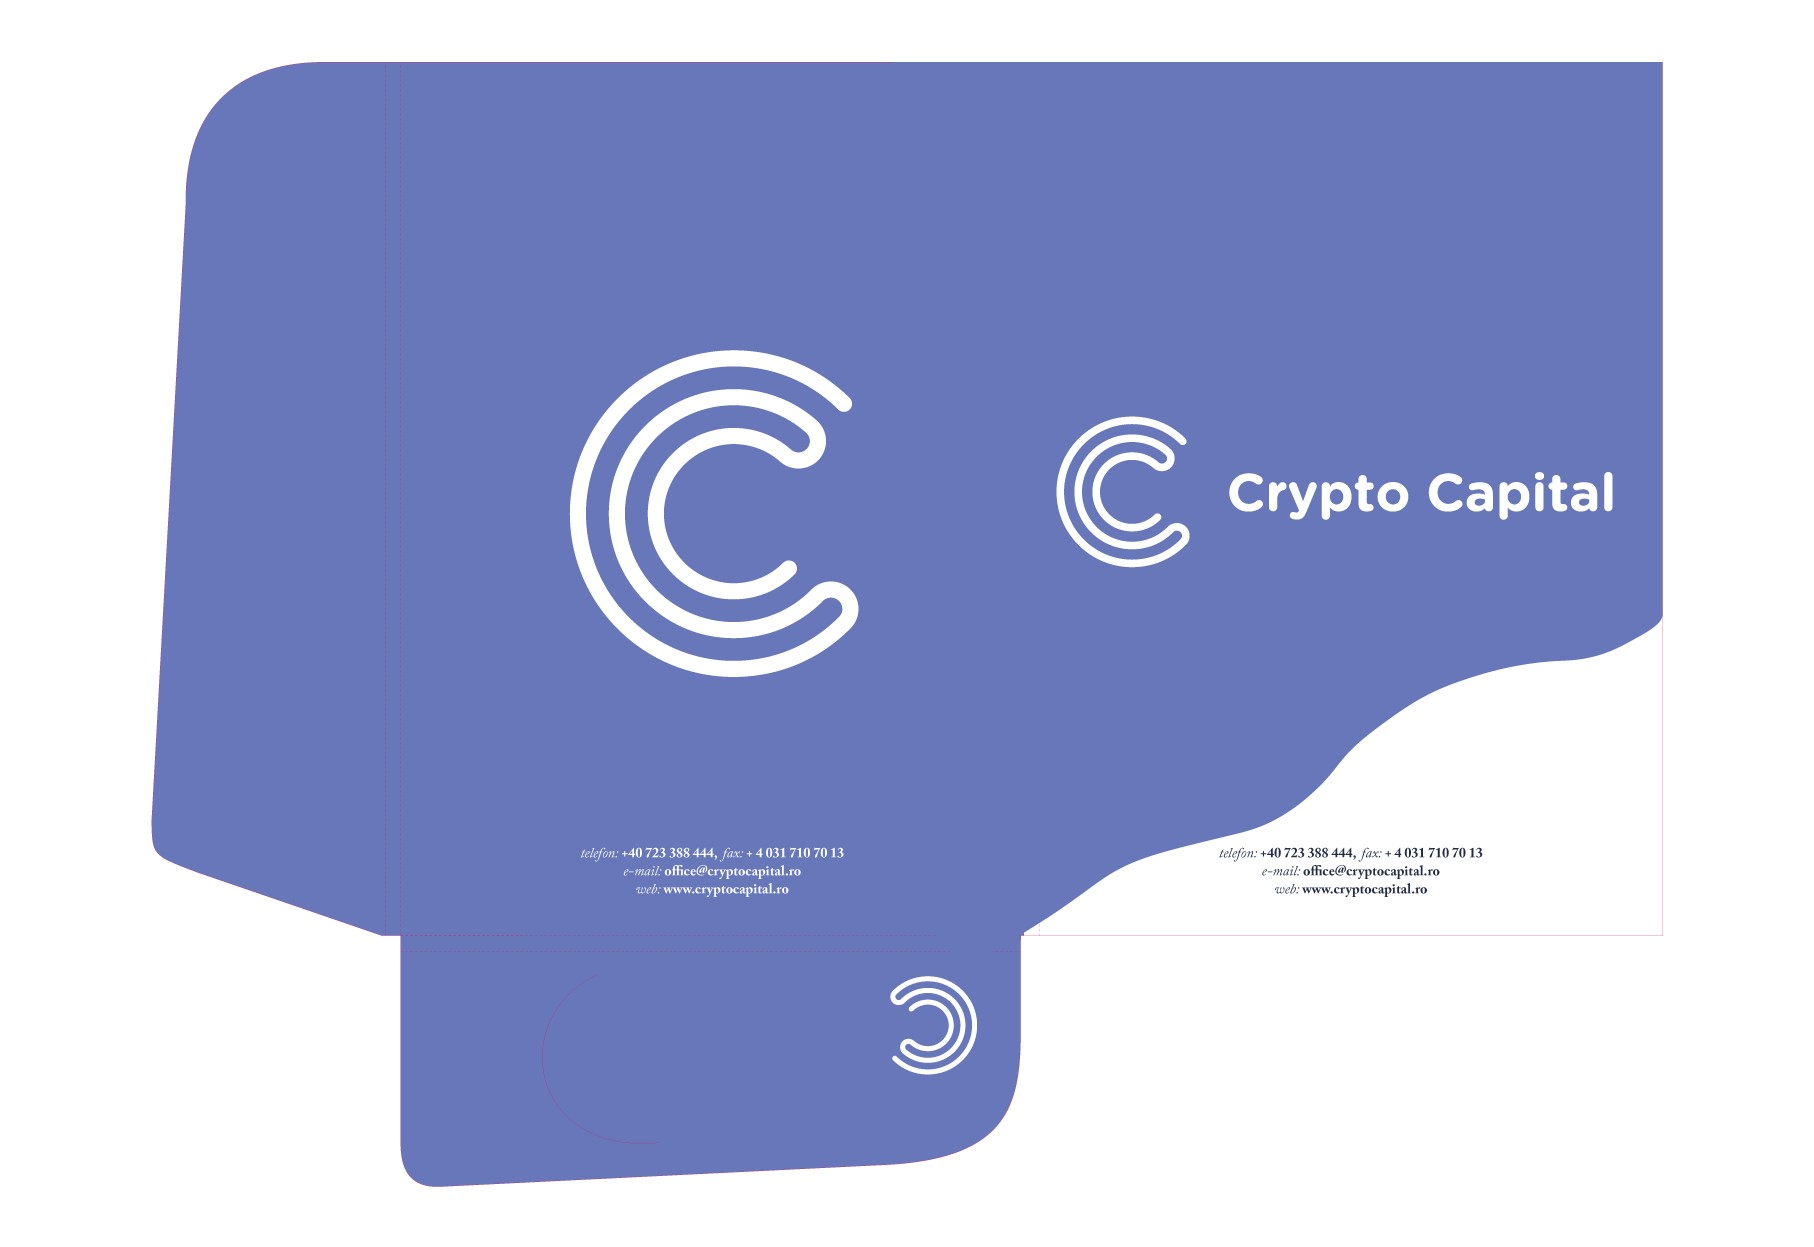 tranzacționare bitcoin vs ethereum criptocurrency consultant de investiții